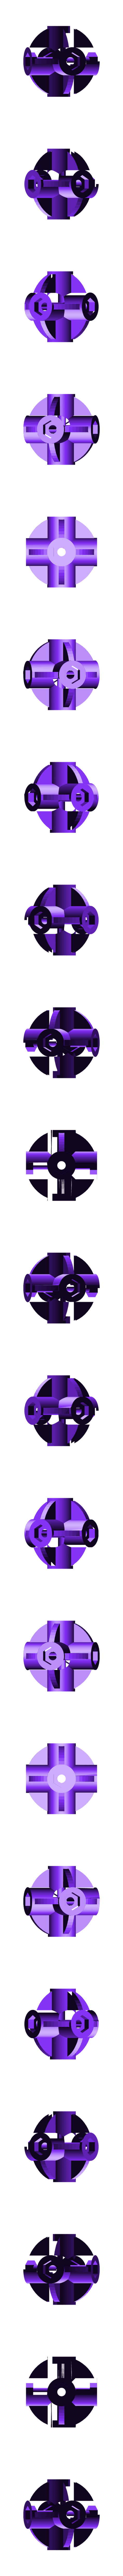 Core_remix.stl Download free STL file Rubik's Cube Remixed • 3D printable design, lowboydrvr